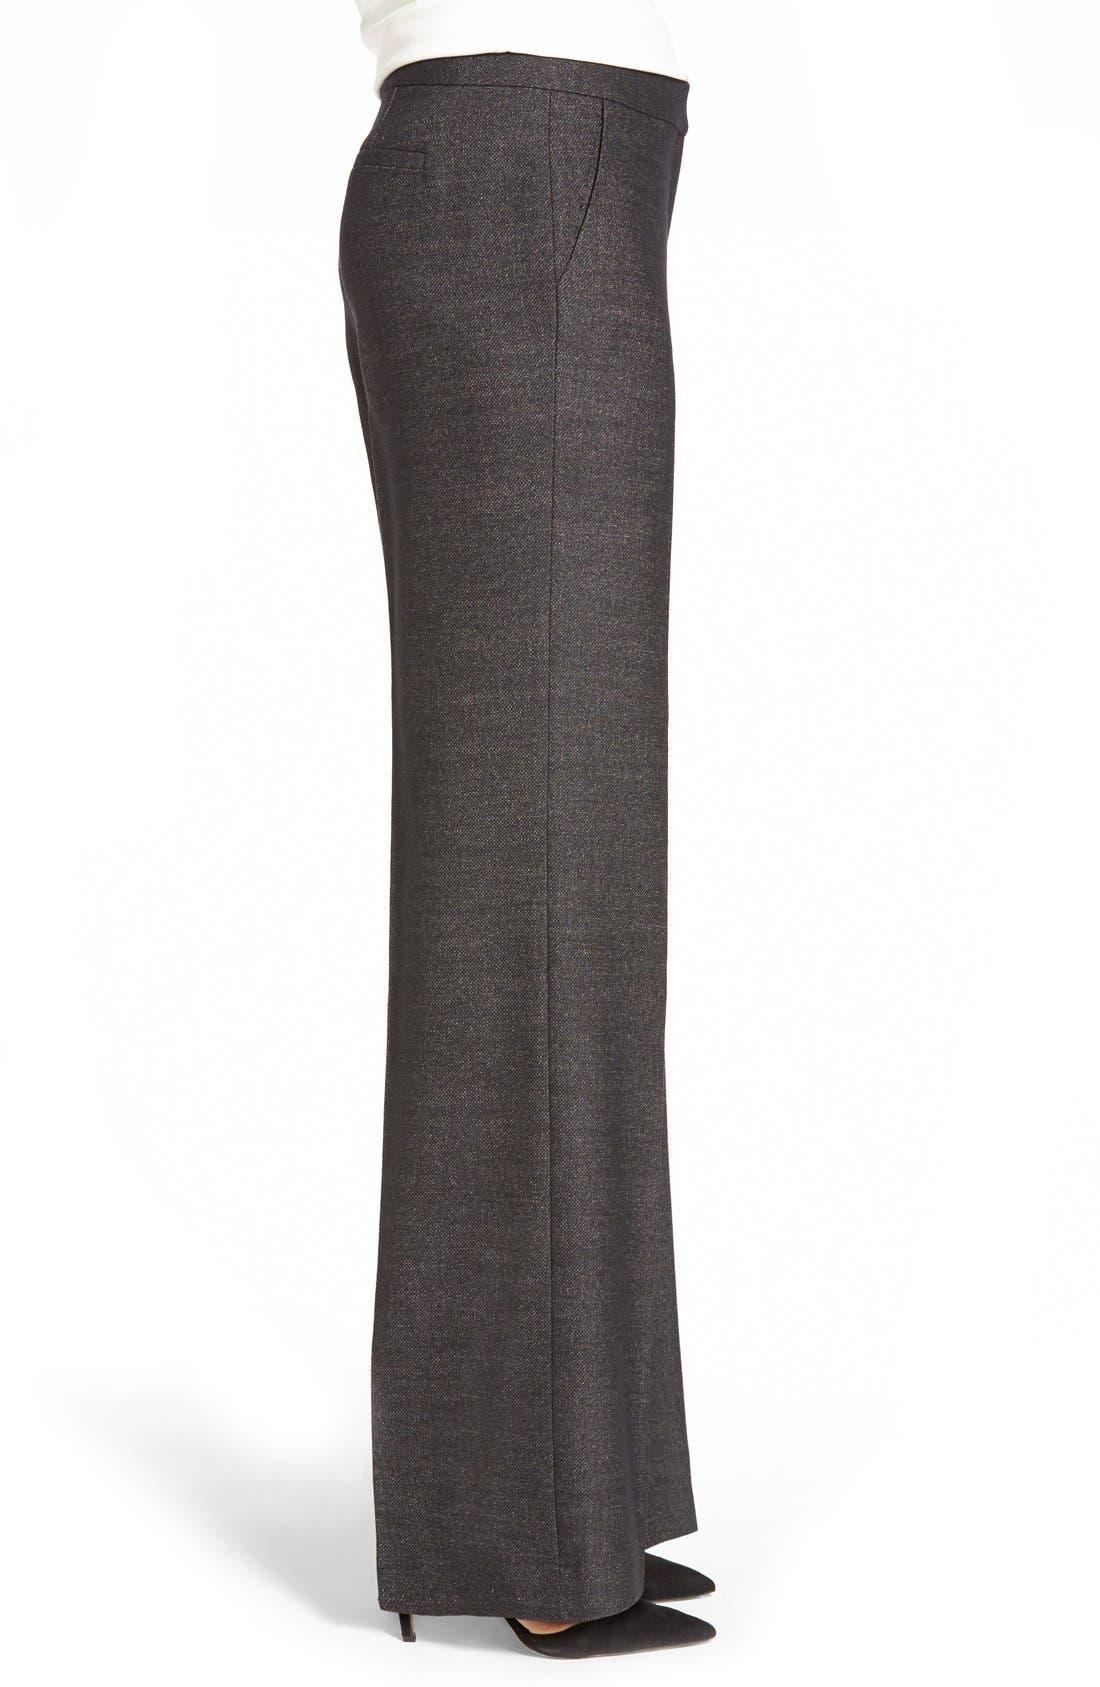 Alternate Image 3  - Classiques Entier® 'Verona' Suiting Trousers (Regular & Petite)